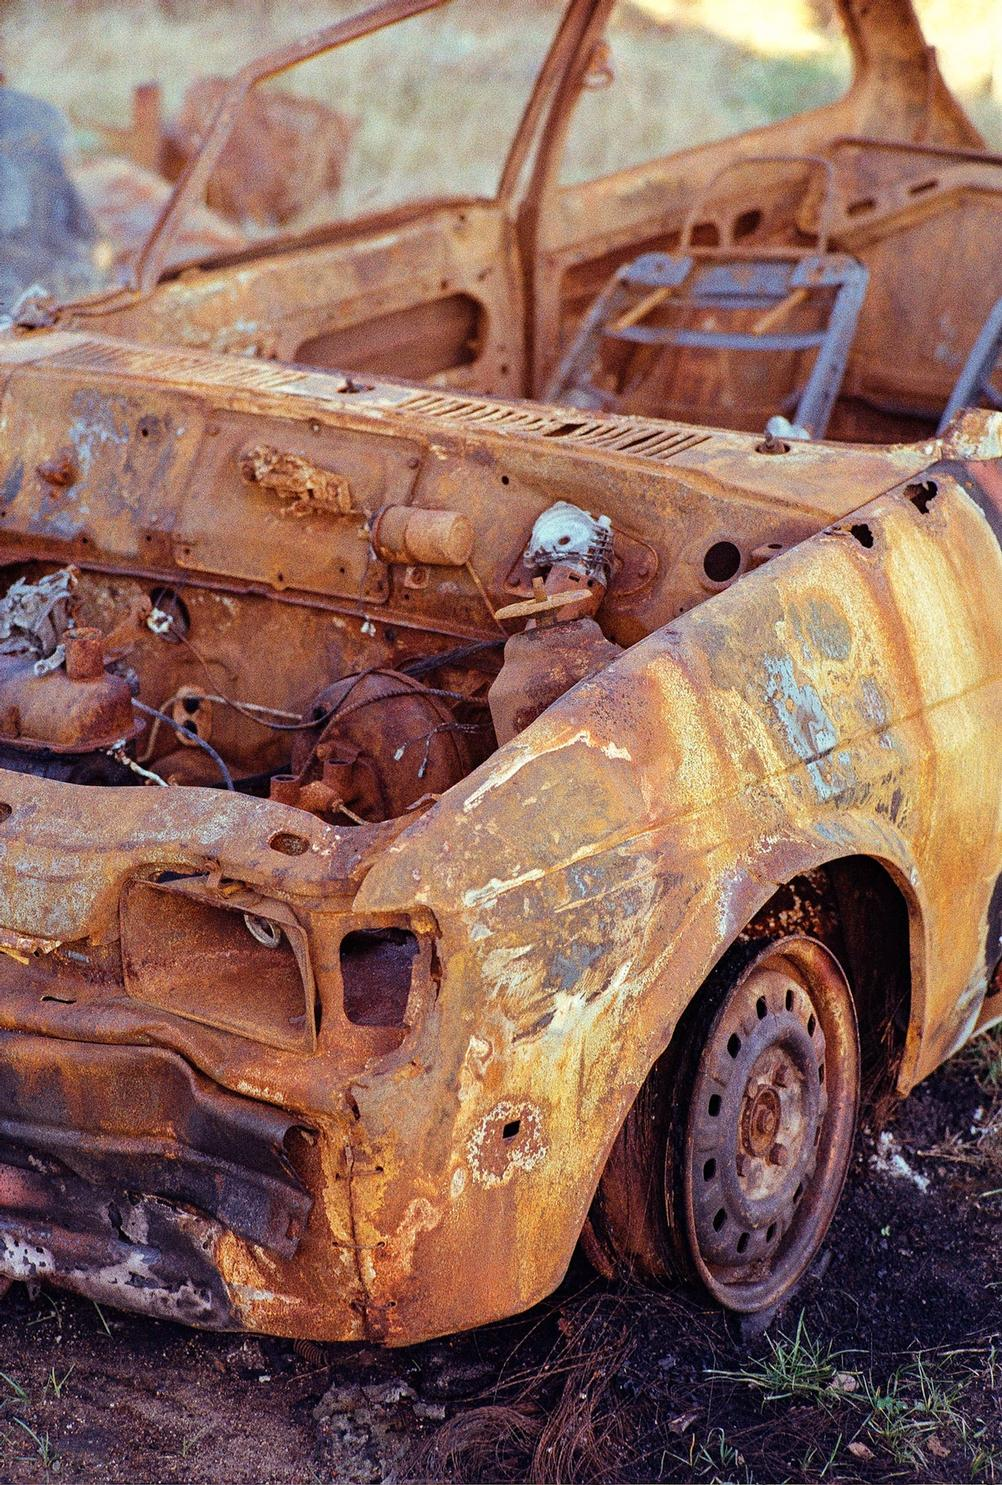 Closeup of a rusted car.